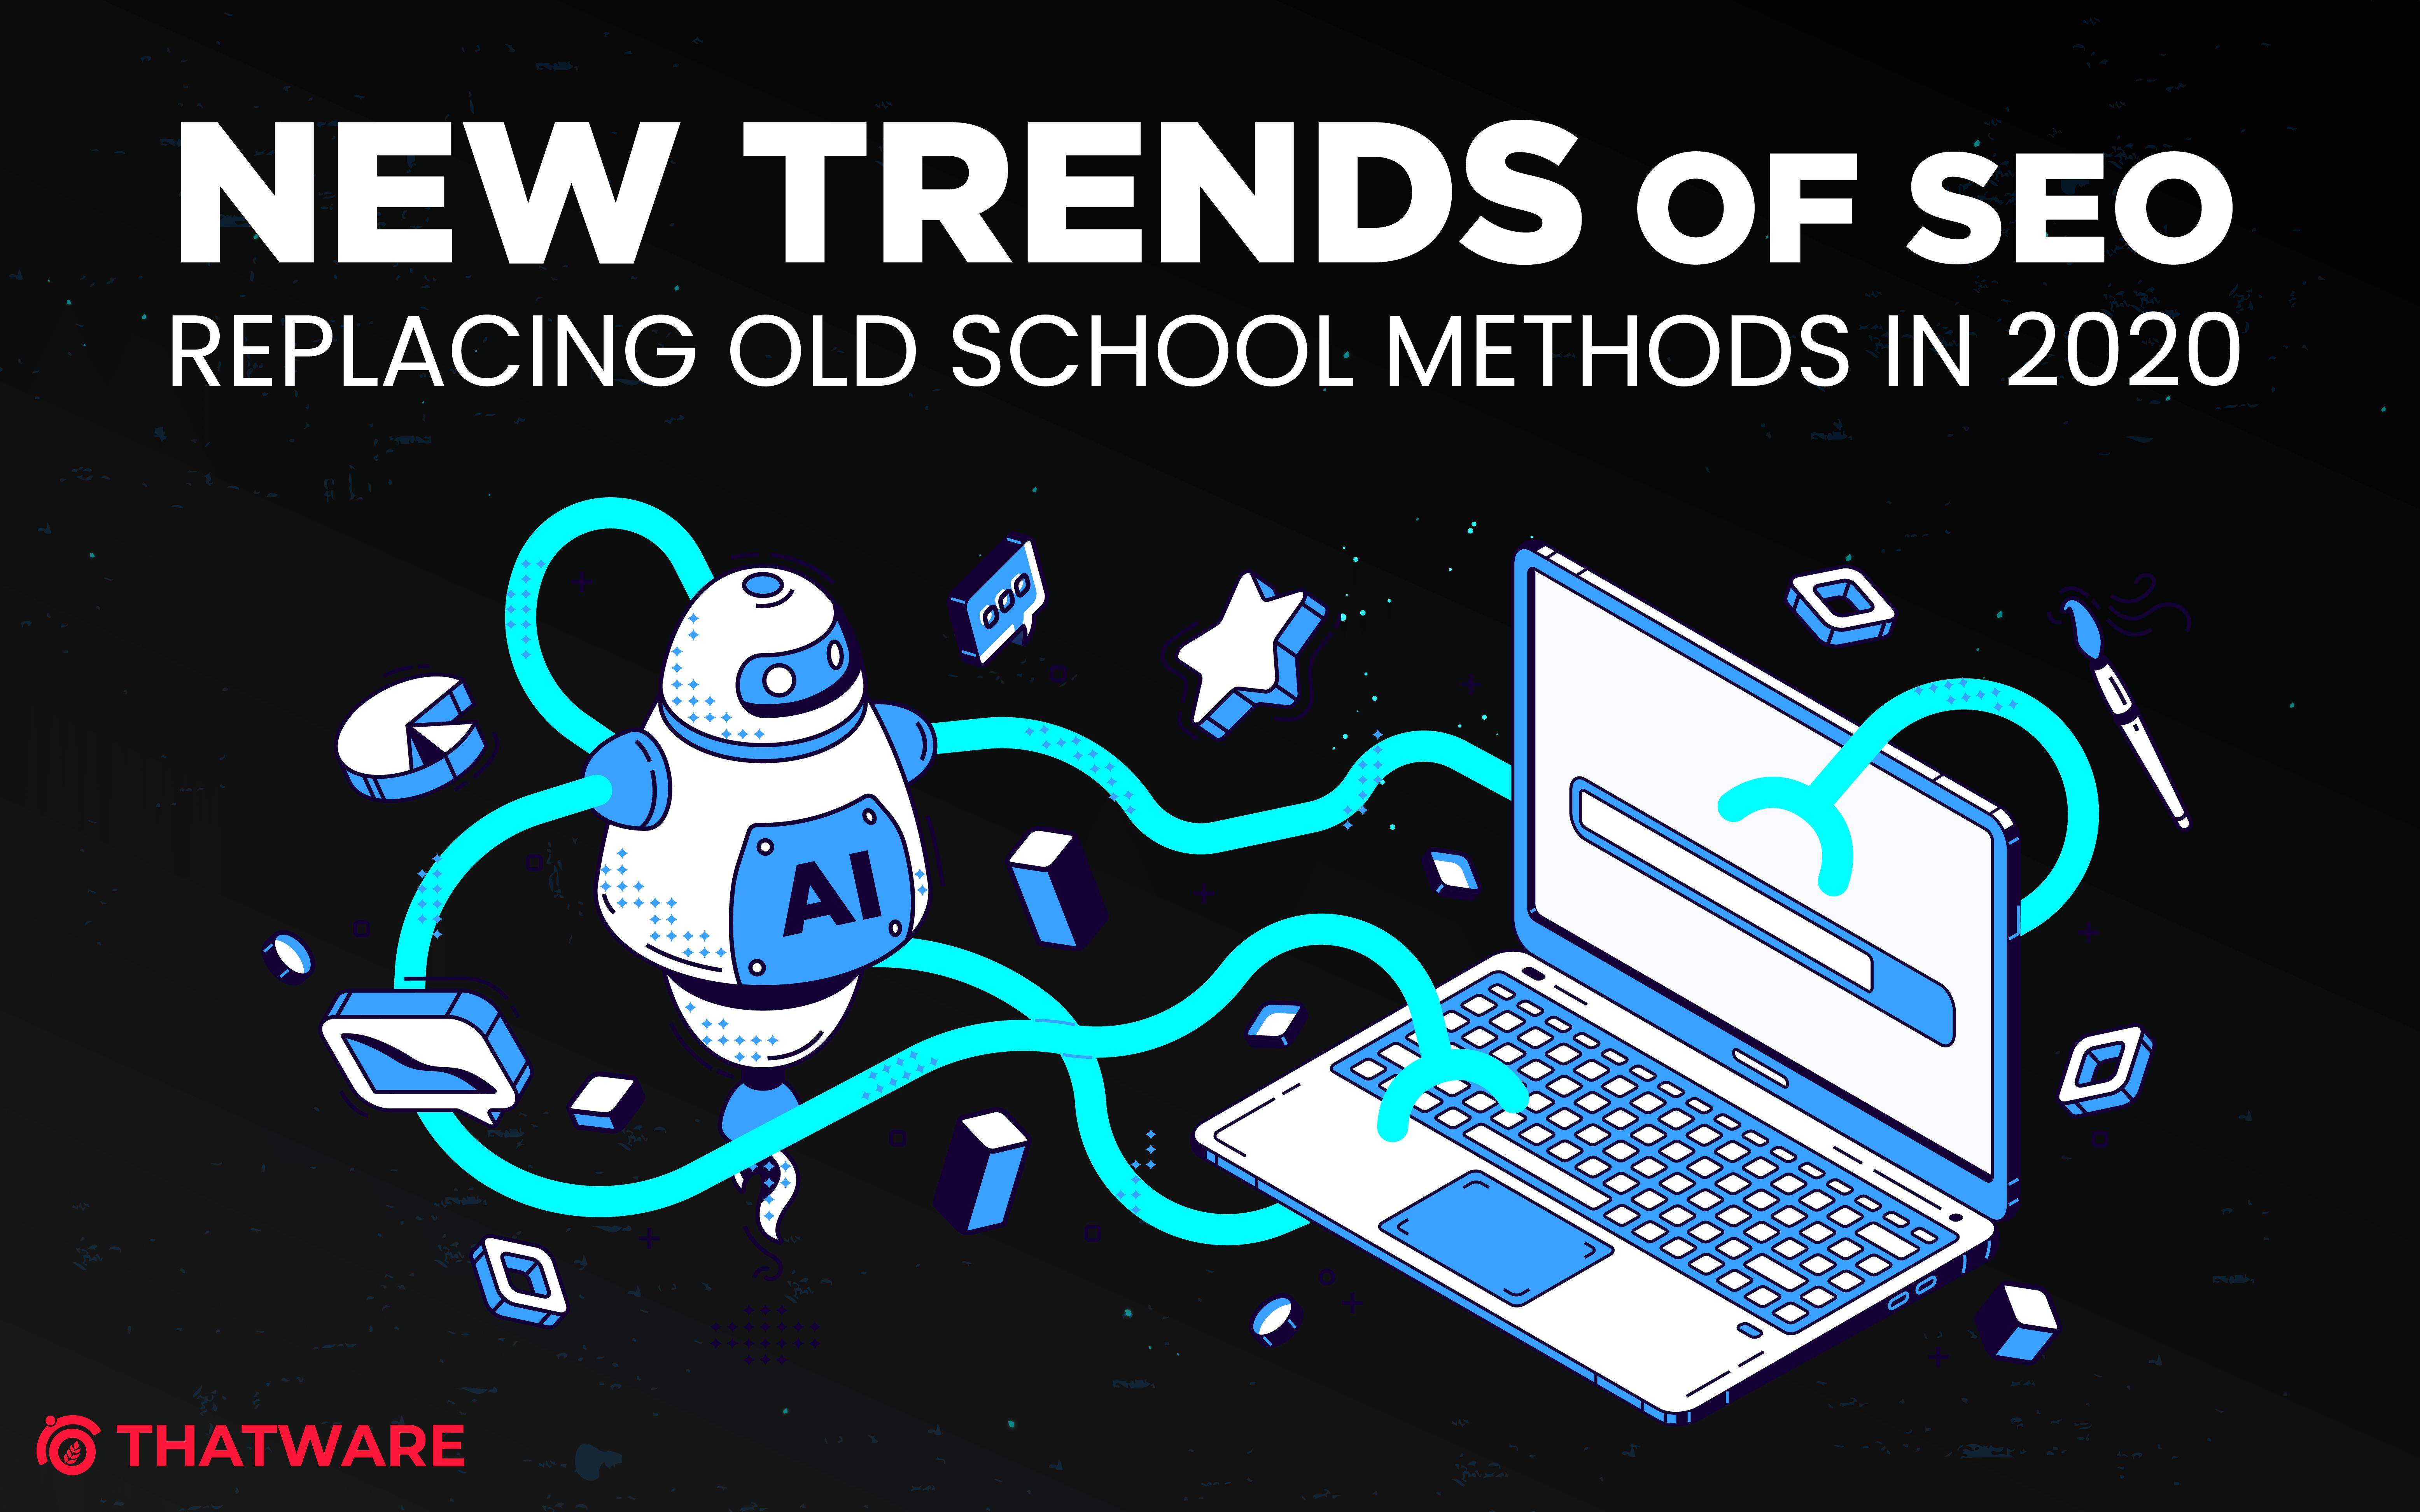 New SEO trends